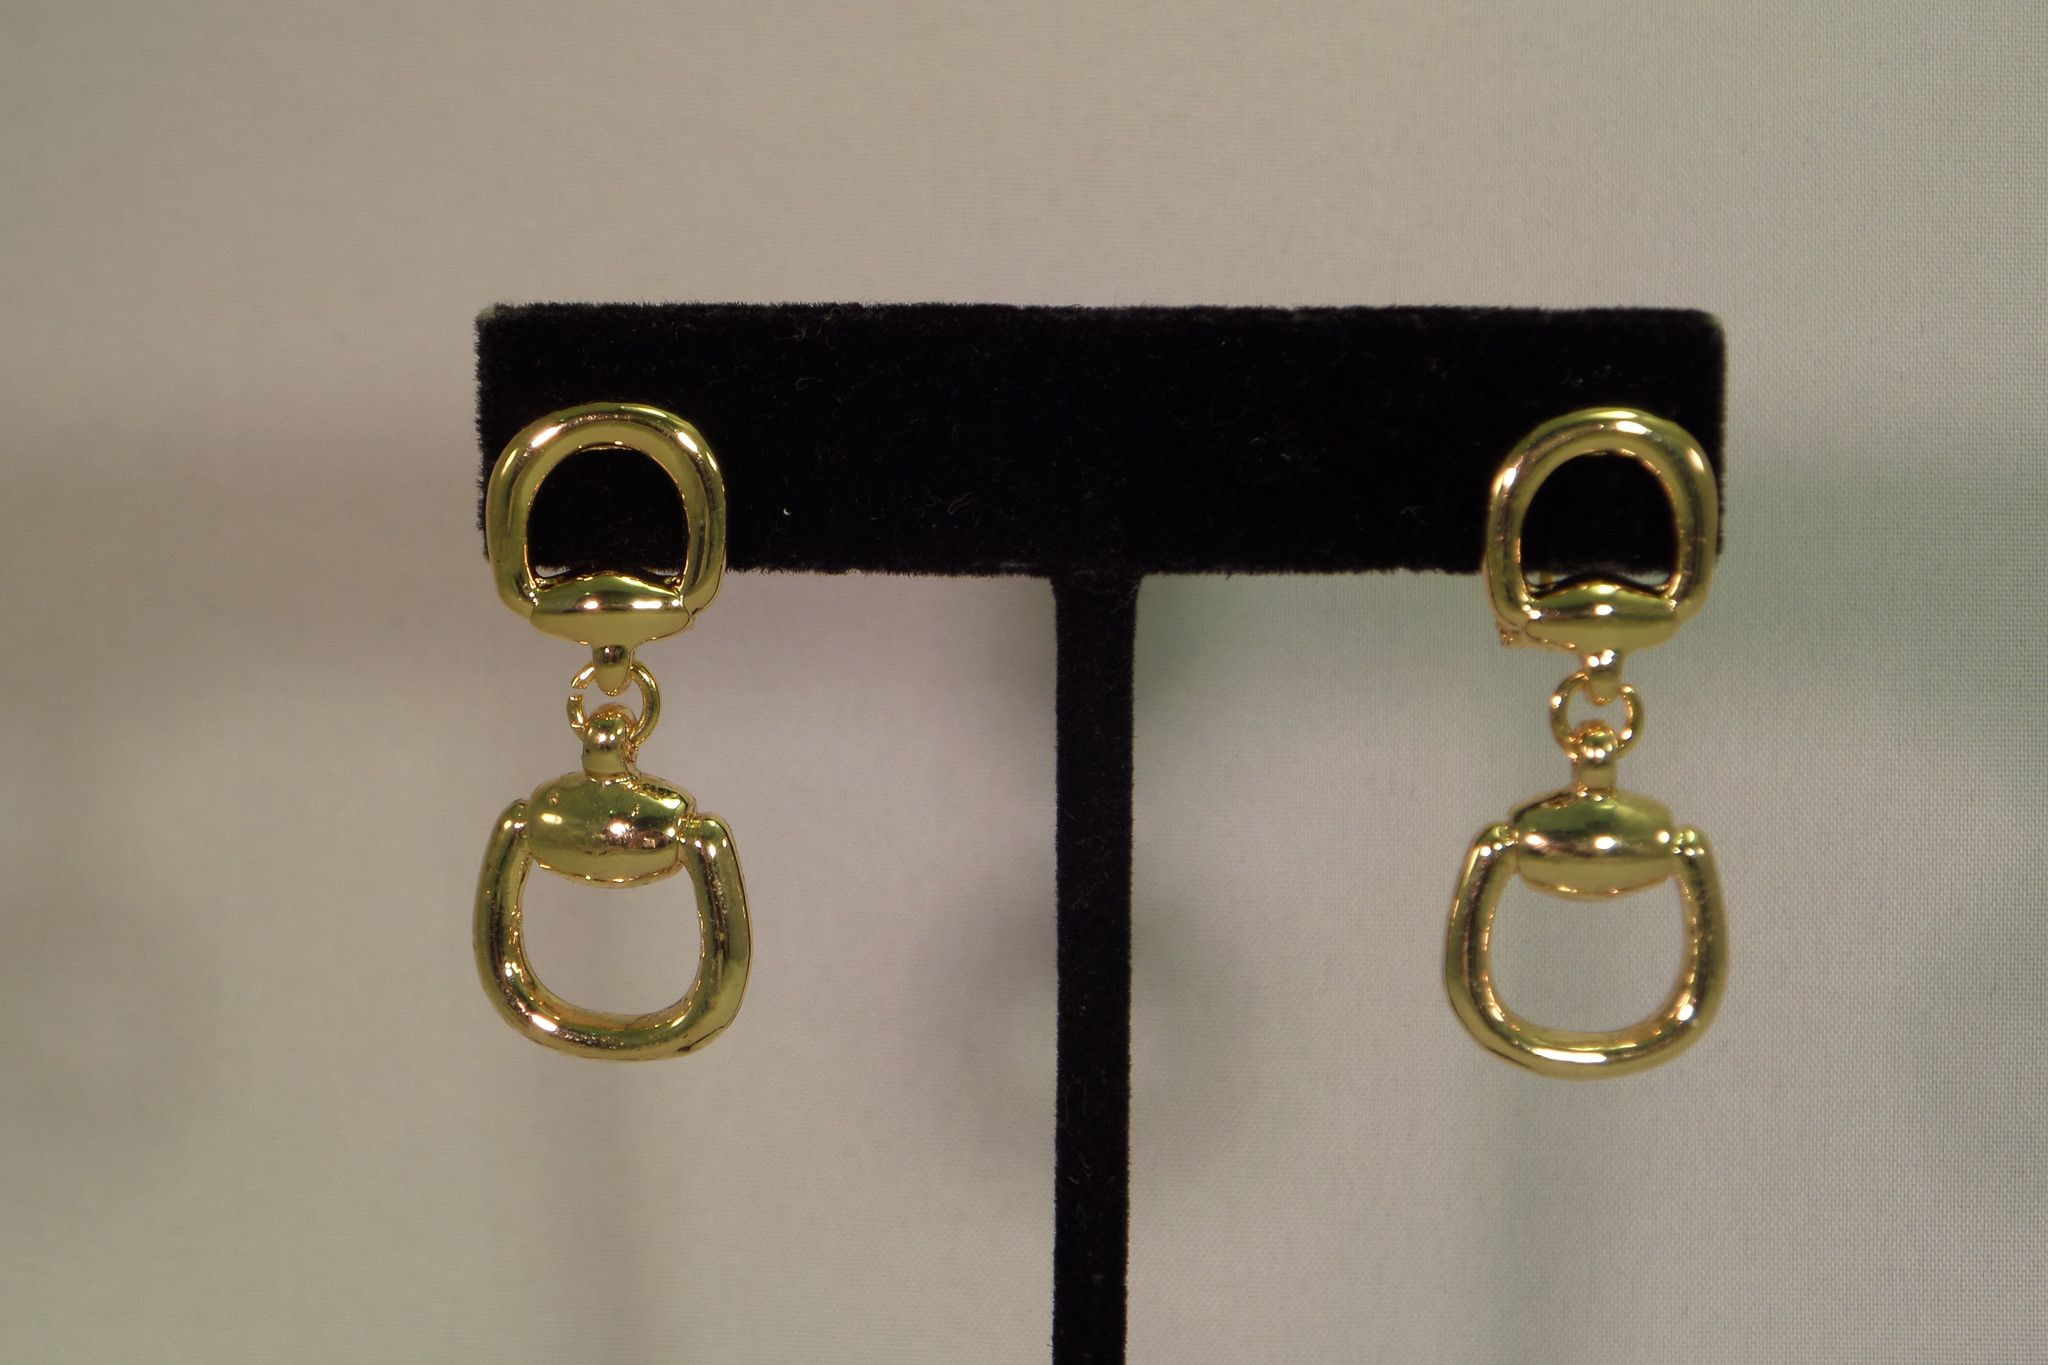 Gold horsebit dangle earrings